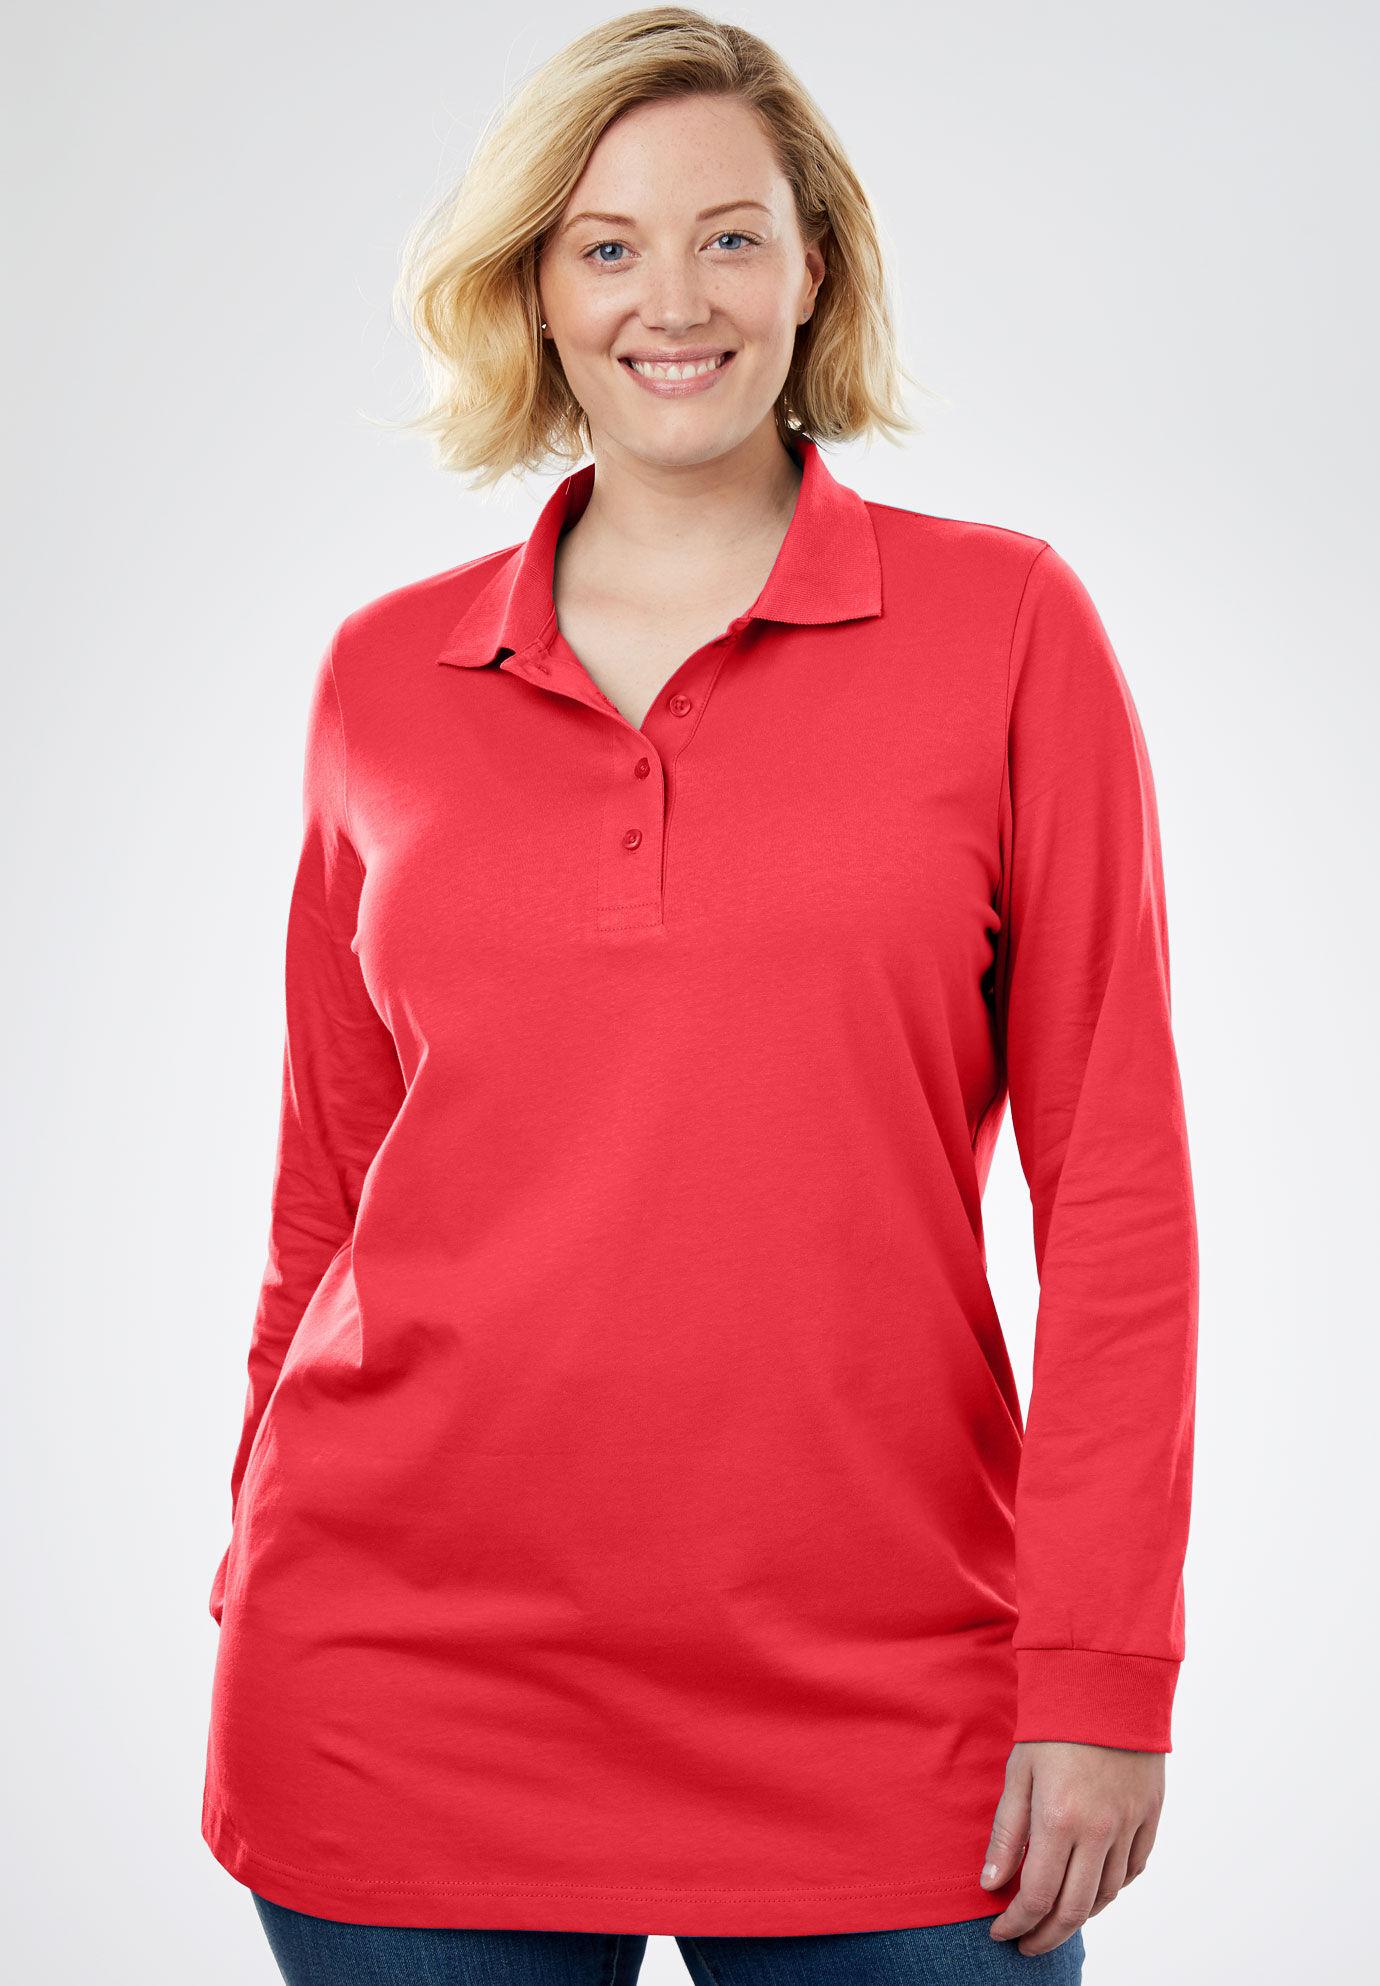 6b67d9944c5 37106 89feb  discount code for long sleeve polo tee 58d2f 39479